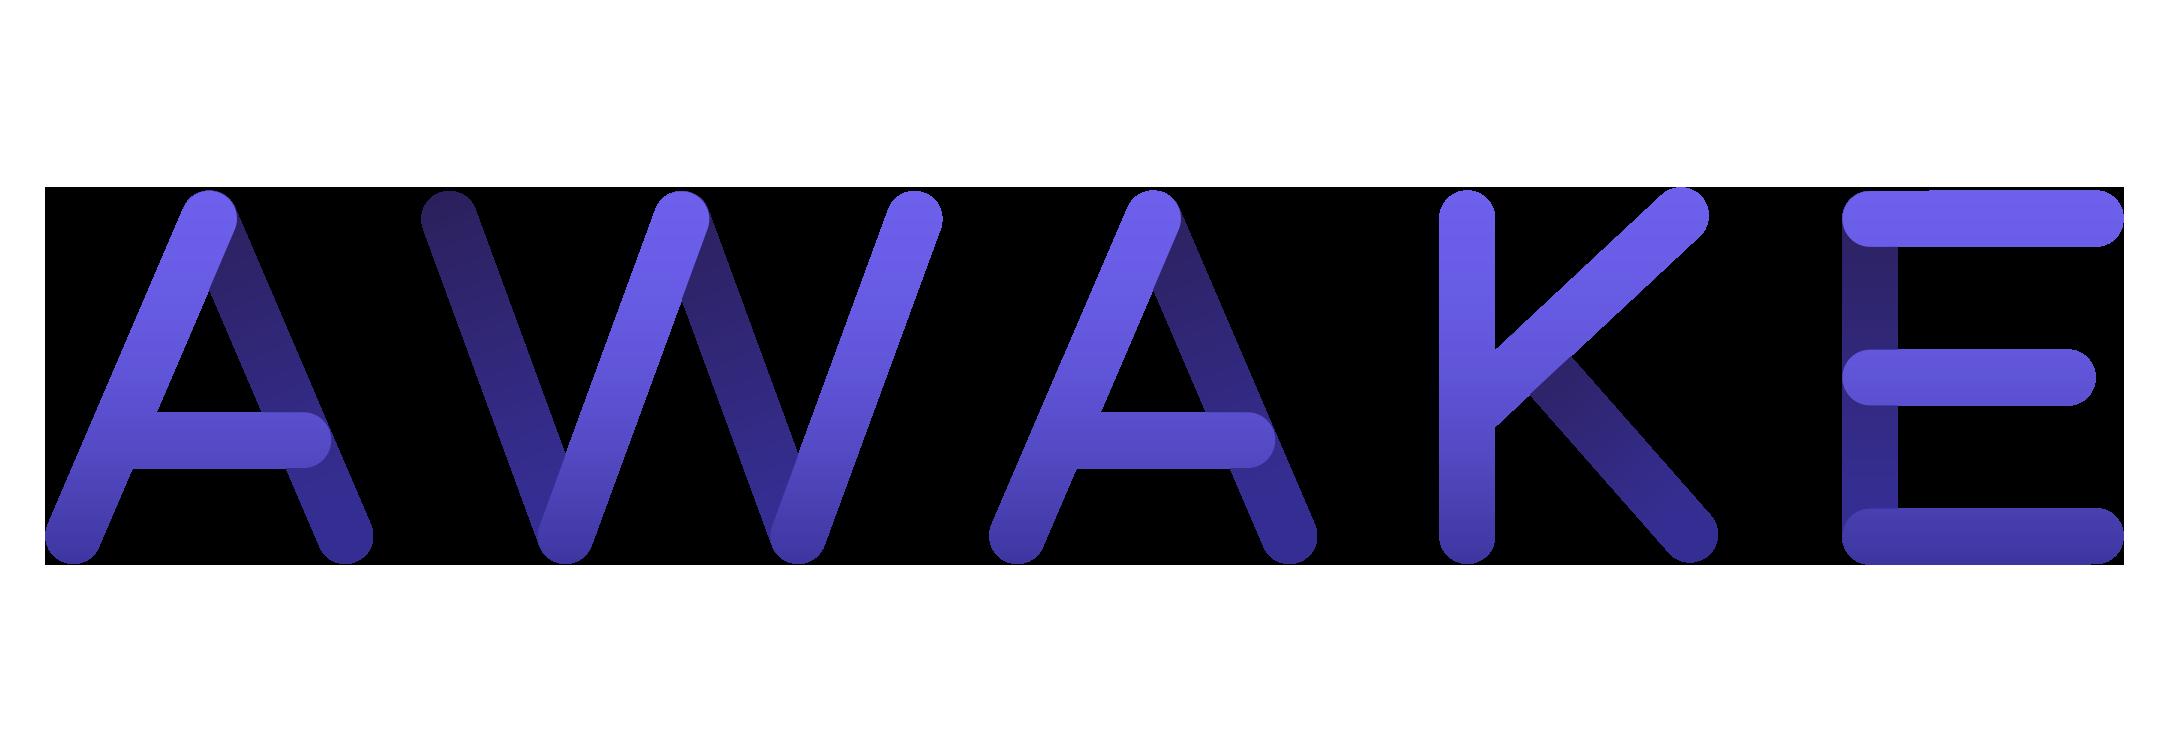 Awake Security Platform logo